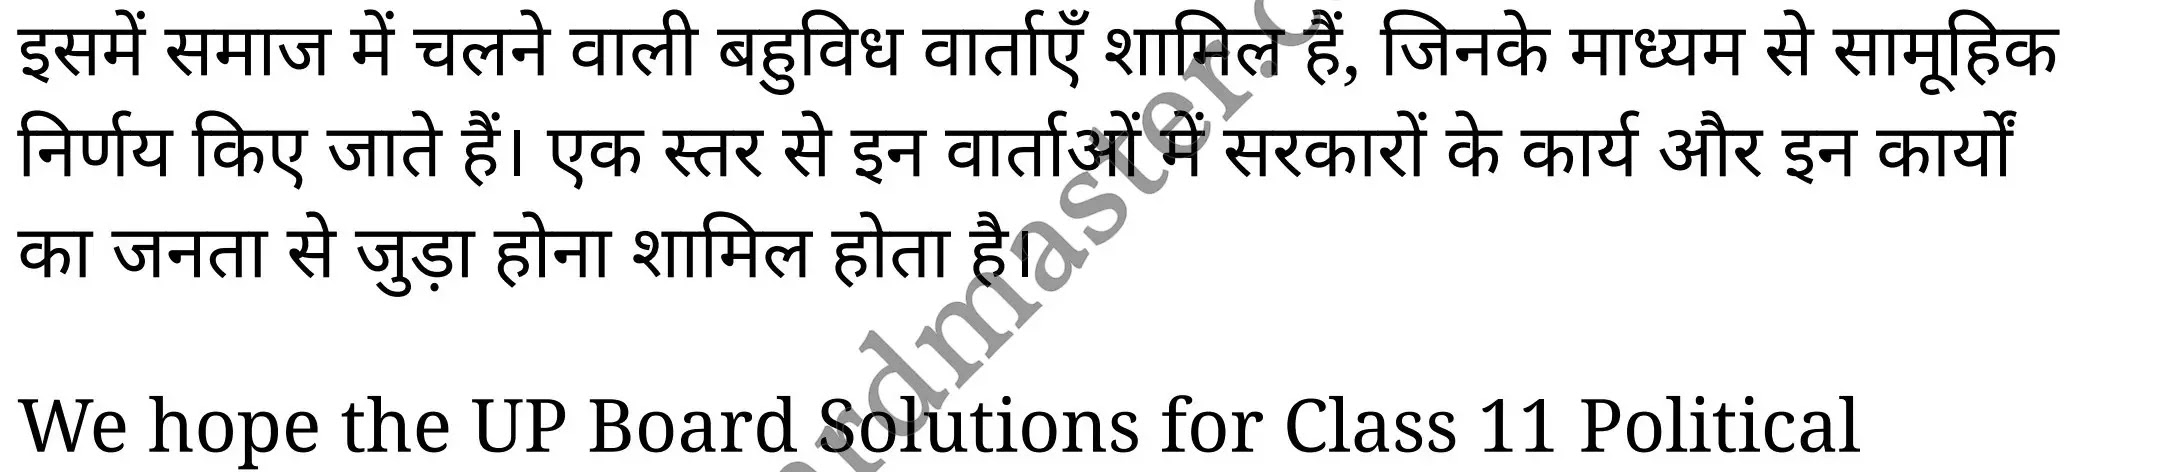 कक्षा 11 नागरिकशास्त्र  राजनीतिक सिद्धांत अध्याय 1  के नोट्स  हिंदी में एनसीईआरटी समाधान,     class 11 civics chapter 1,   class 11 civics chapter 1 ncert solutions in civics,  class 11 civics chapter 1 notes in hindi,   class 11 civics chapter 1 question answer,   class 11 civics chapter 1 notes,   class 11 civics chapter 1 class 11 civics  chapter 1 in  hindi,    class 11 civics chapter 1 important questions in  hindi,   class 11 civics hindi  chapter 1 notes in hindi,   class 11 civics  chapter 1 test,   class 11 civics  chapter 1 class 11 civics  chapter 1 pdf,   class 11 civics  chapter 1 notes pdf,   class 11 civics  chapter 1 exercise solutions,  class 11 civics  chapter 1,  class 11 civics  chapter 1 notes study rankers,  class 11 civics  chapter 1 notes,   class 11 civics hindi  chapter 1 notes,    class 11 civics   chapter 1  class 11  notes pdf,  class 11 civics  chapter 1 class 11  notes  ncert,  class 11 civics  chapter 1 class 11 pdf,   class 11 civics  chapter 1  book,   class 11 civics  chapter 1 quiz class 11  ,    11  th class 11 civics chapter 1  book up board,   up board 11  th class 11 civics chapter 1 notes,  class 11 civics  Political theory chapter 1,   class 11 civics  Political theory chapter 1 ncert solutions in civics,   class 11 civics  Political theory chapter 1 notes in hindi,   class 11 civics  Political theory chapter 1 question answer,   class 11 civics  Political theory  chapter 1 notes,  class 11 civics  Political theory  chapter 1 class 11 civics  chapter 1 in  hindi,    class 11 civics  Political theory chapter 1 important questions in  hindi,   class 11 civics  Political theory  chapter 1 notes in hindi,    class 11 civics  Political theory  chapter 1 test,  class 11 civics  Political theory  chapter 1 class 11 civics  chapter 1 pdf,   class 11 civics  Political theory chapter 1 notes pdf,   class 11 civics  Political theory  chapter 1 exercise solutions,   class 11 civics  Political theory  chapter 1,  class 11 civics  Politic